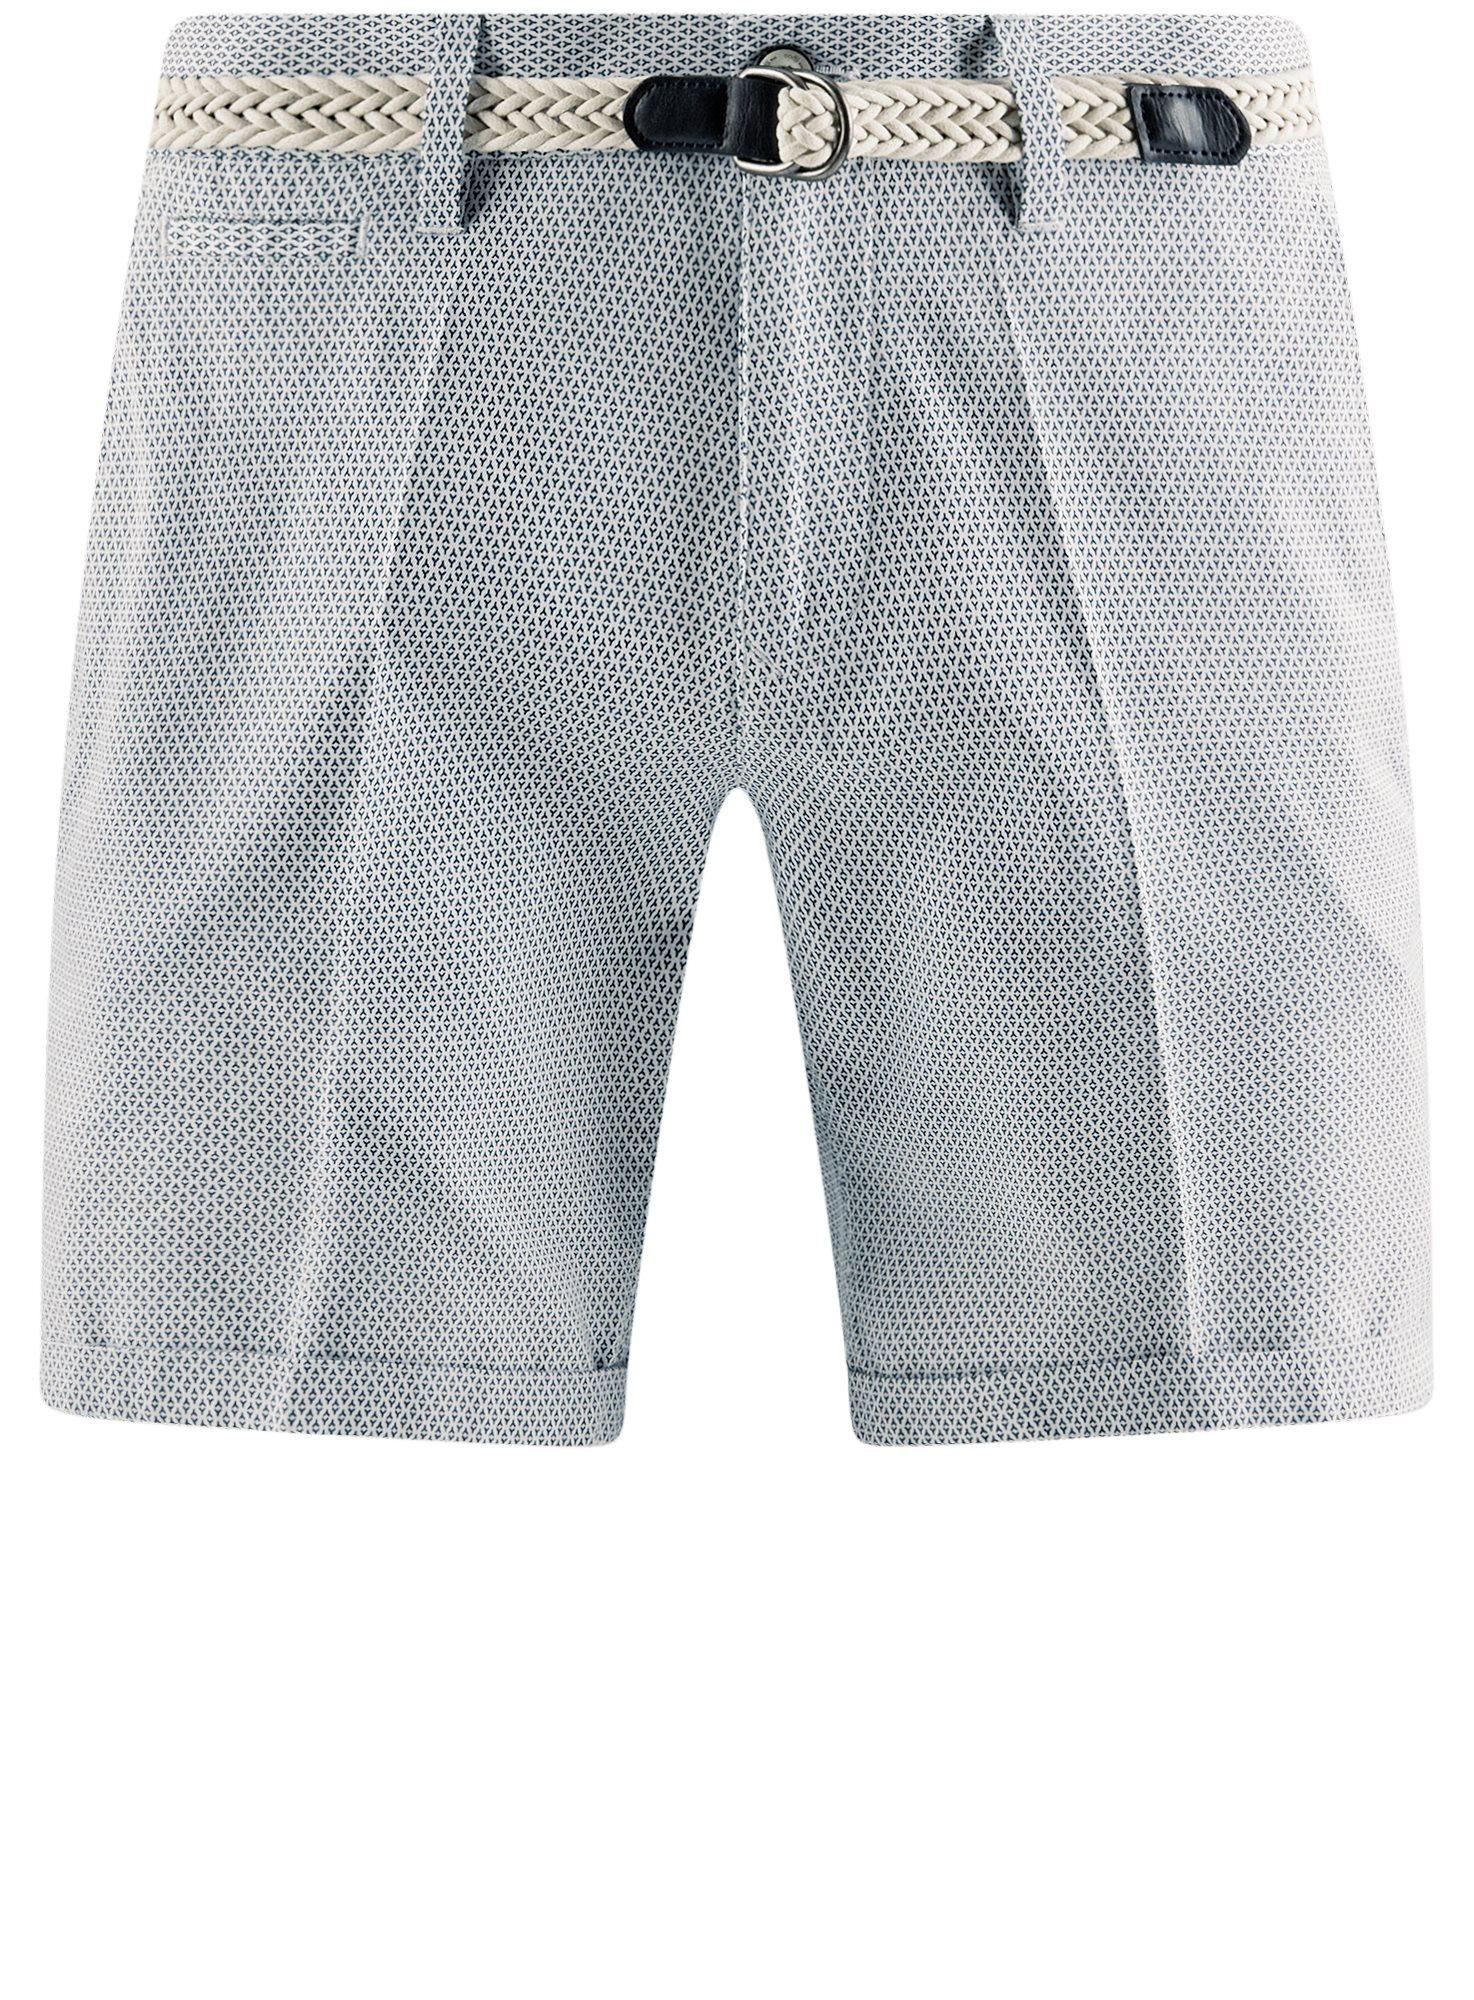 Шорты хлопковые с плетеным ремнем oodji для мужчины (белый), 2L600011M/39344N/1074G